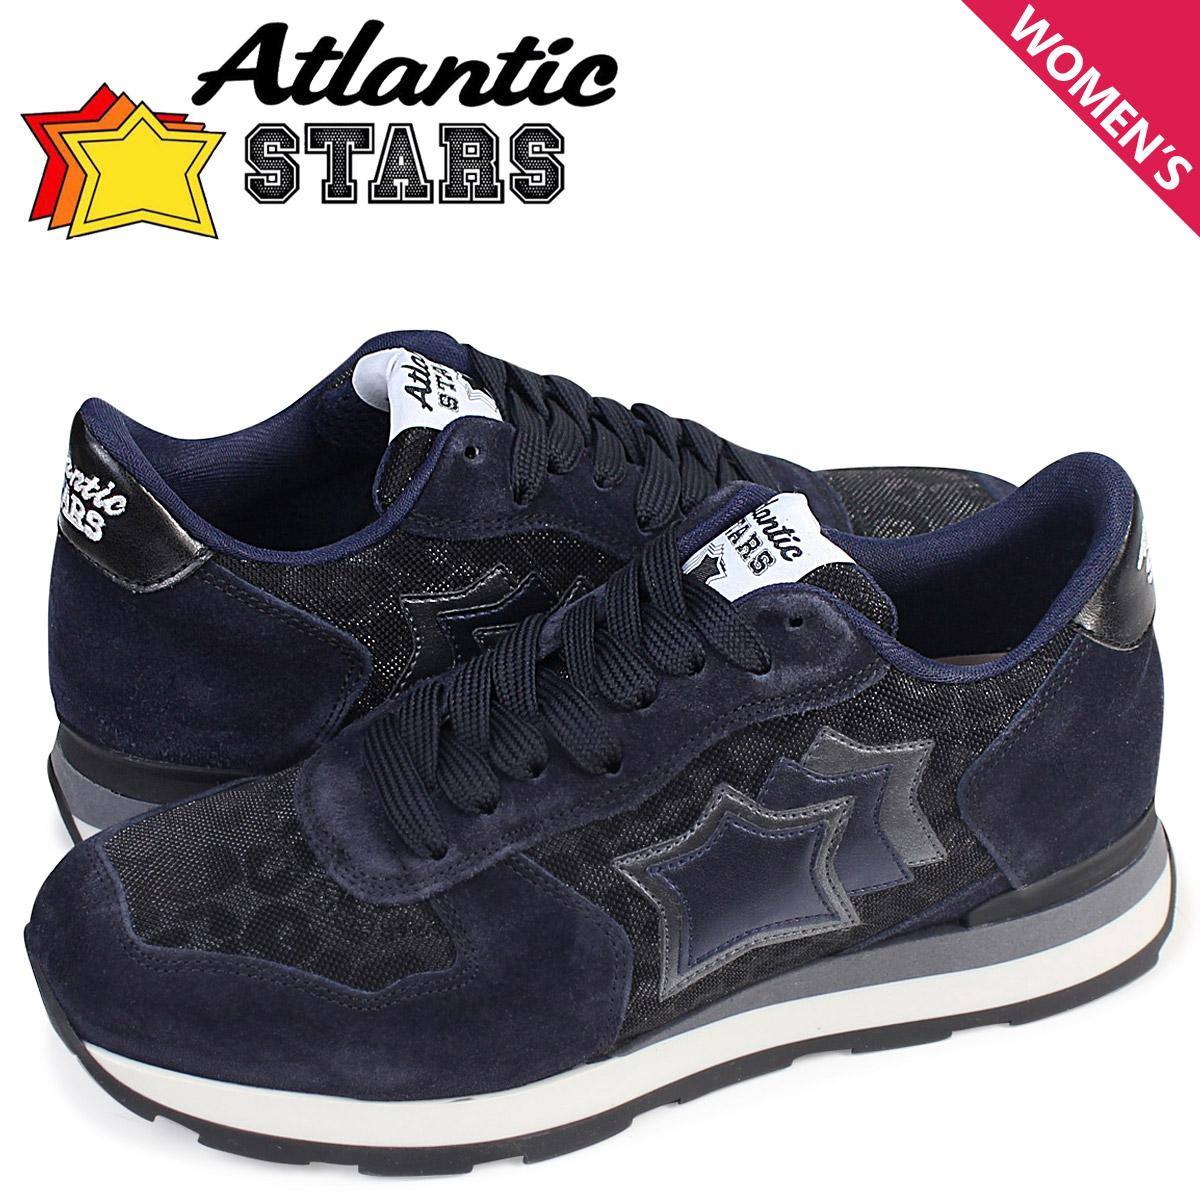 Atlantic STARS VEGA アトランティックスターズ レディース スニーカー ベガ ANY 81N 靴 ネイビー